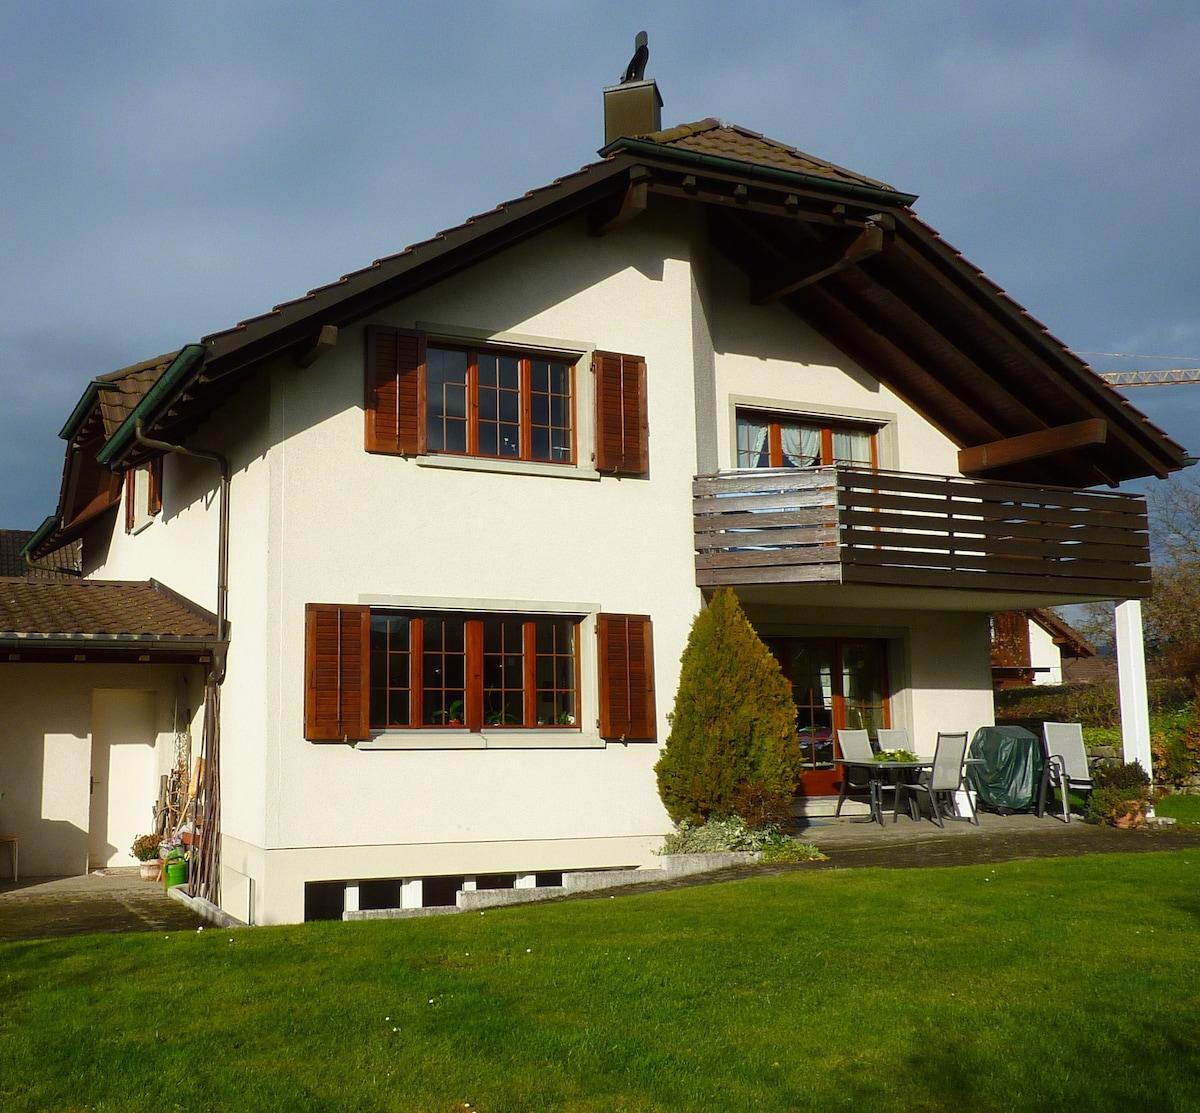 Fischbach Göslikon 2018 (with Photos): Top 20 Fischbach Göslikon Vacation  Rentals, Vacation Homes U0026 Condo Rentals   Airbnb Fischbach Göslikon,  Aargau, ...